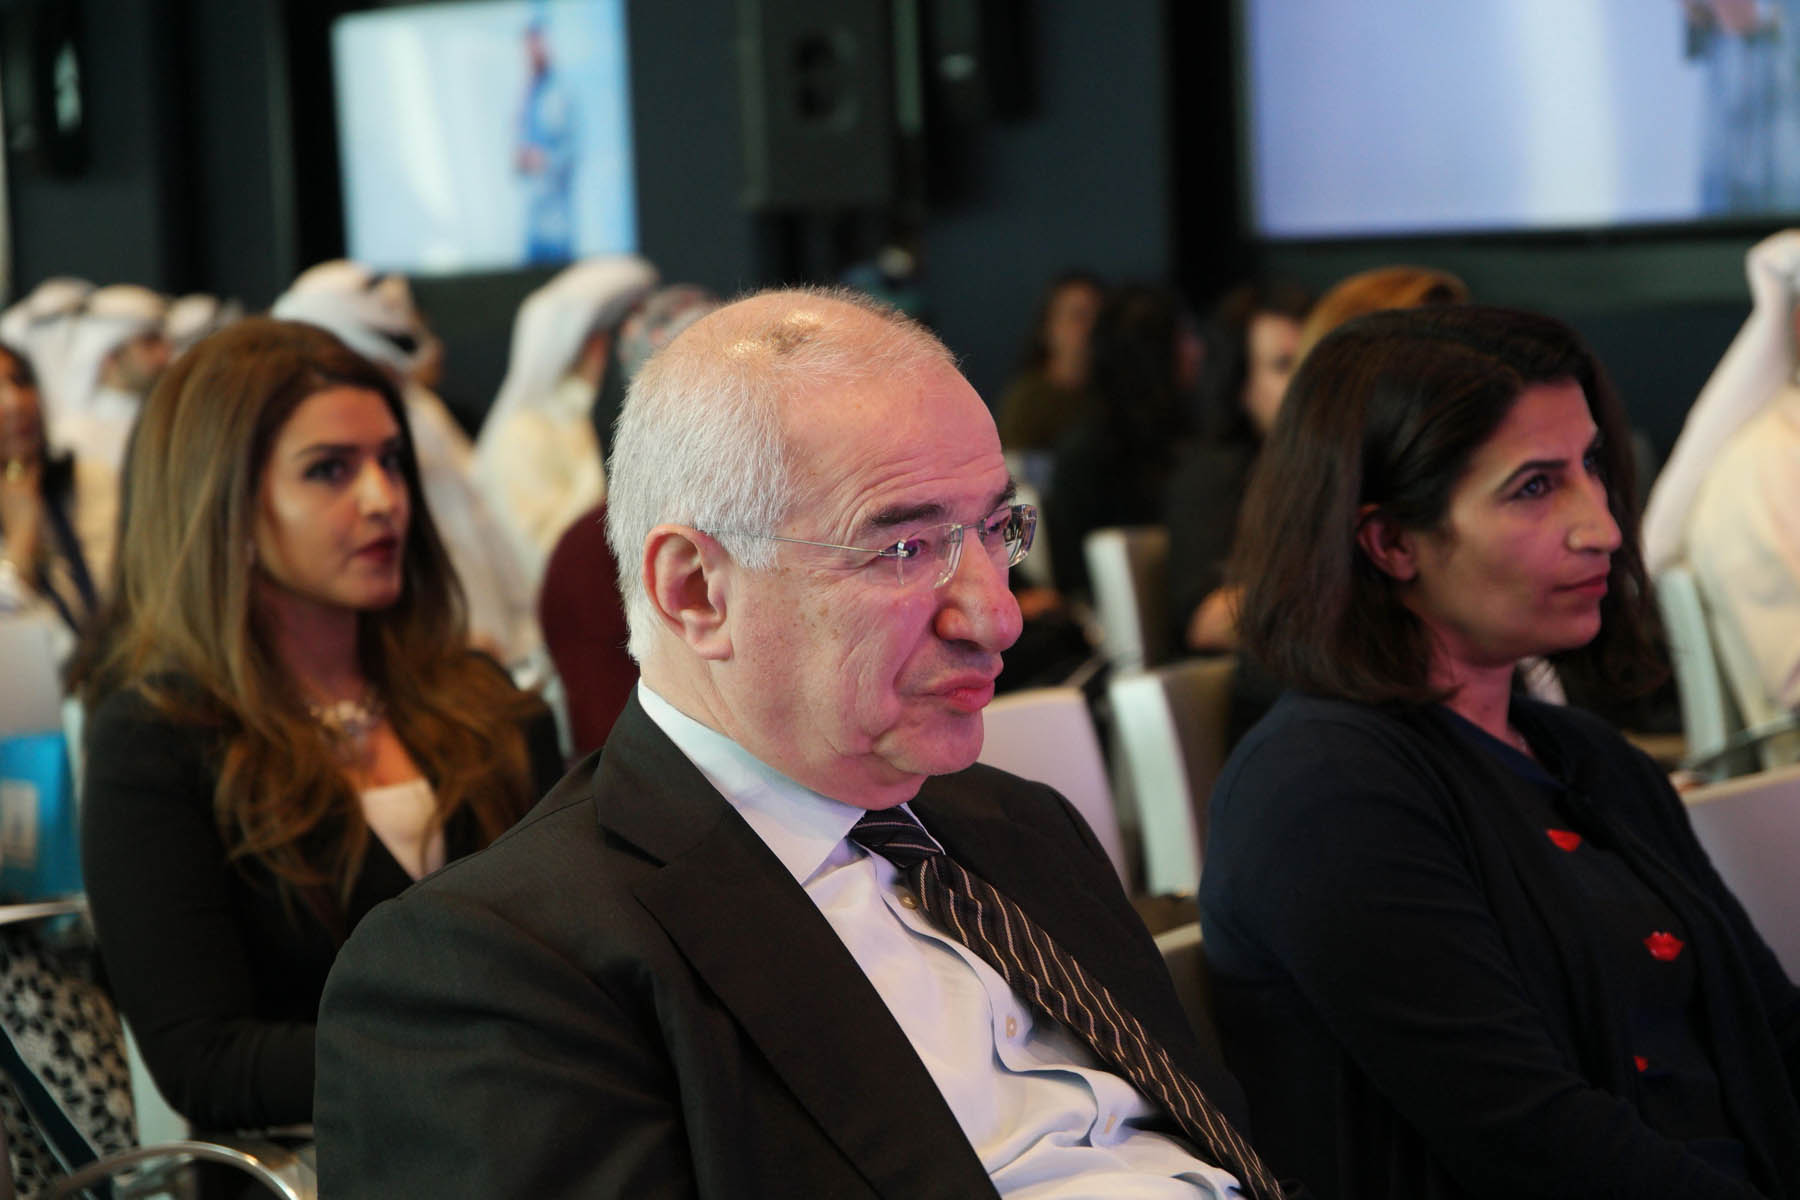 Mr.-Samer-Khanachet-KIPCO-COO-was-attending-Kipcos-CSR-forum1-min